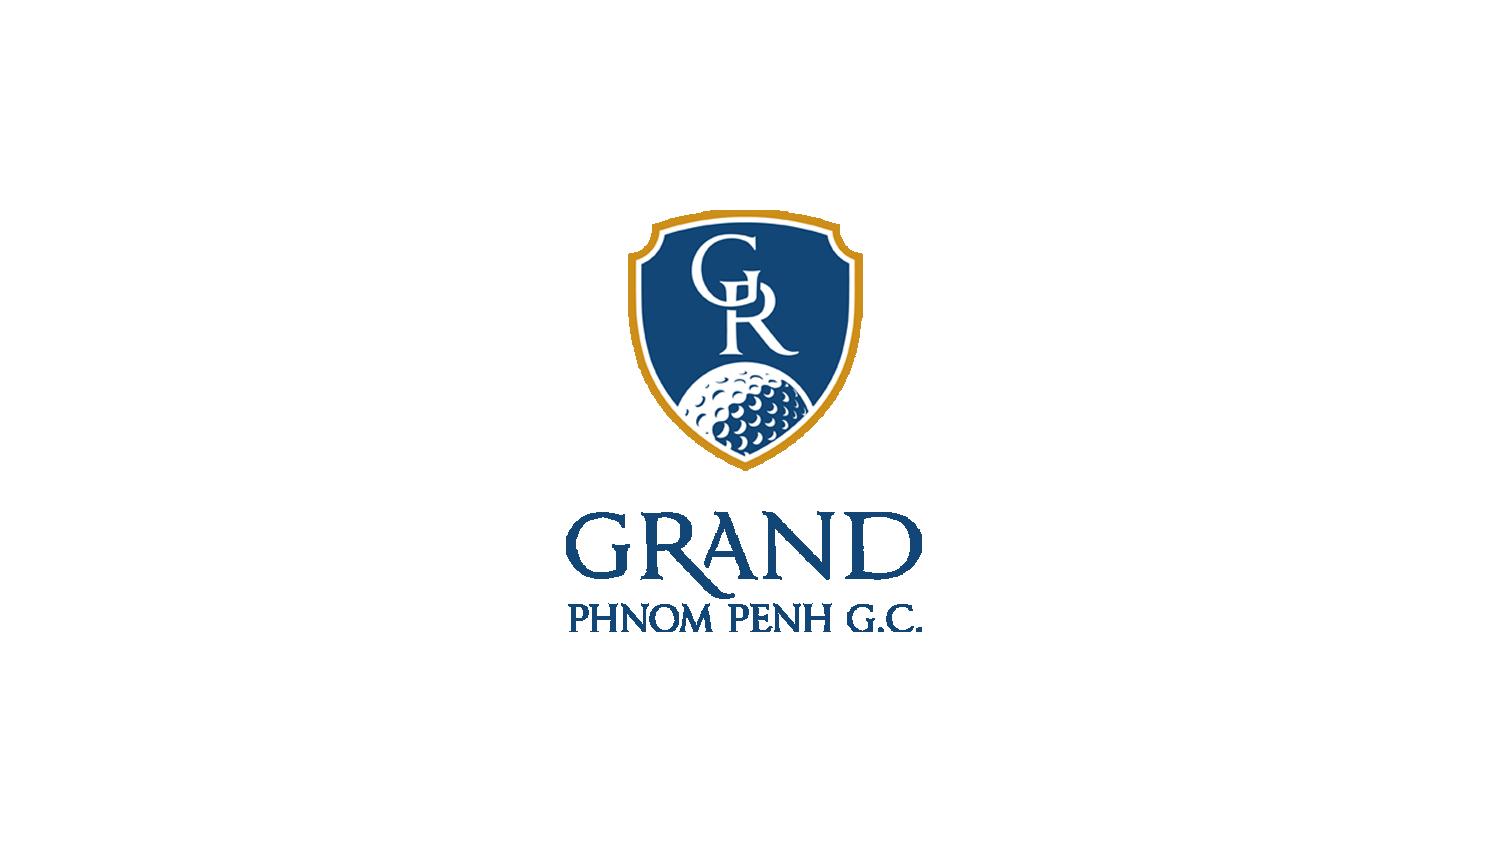 Grand Phnom Penh